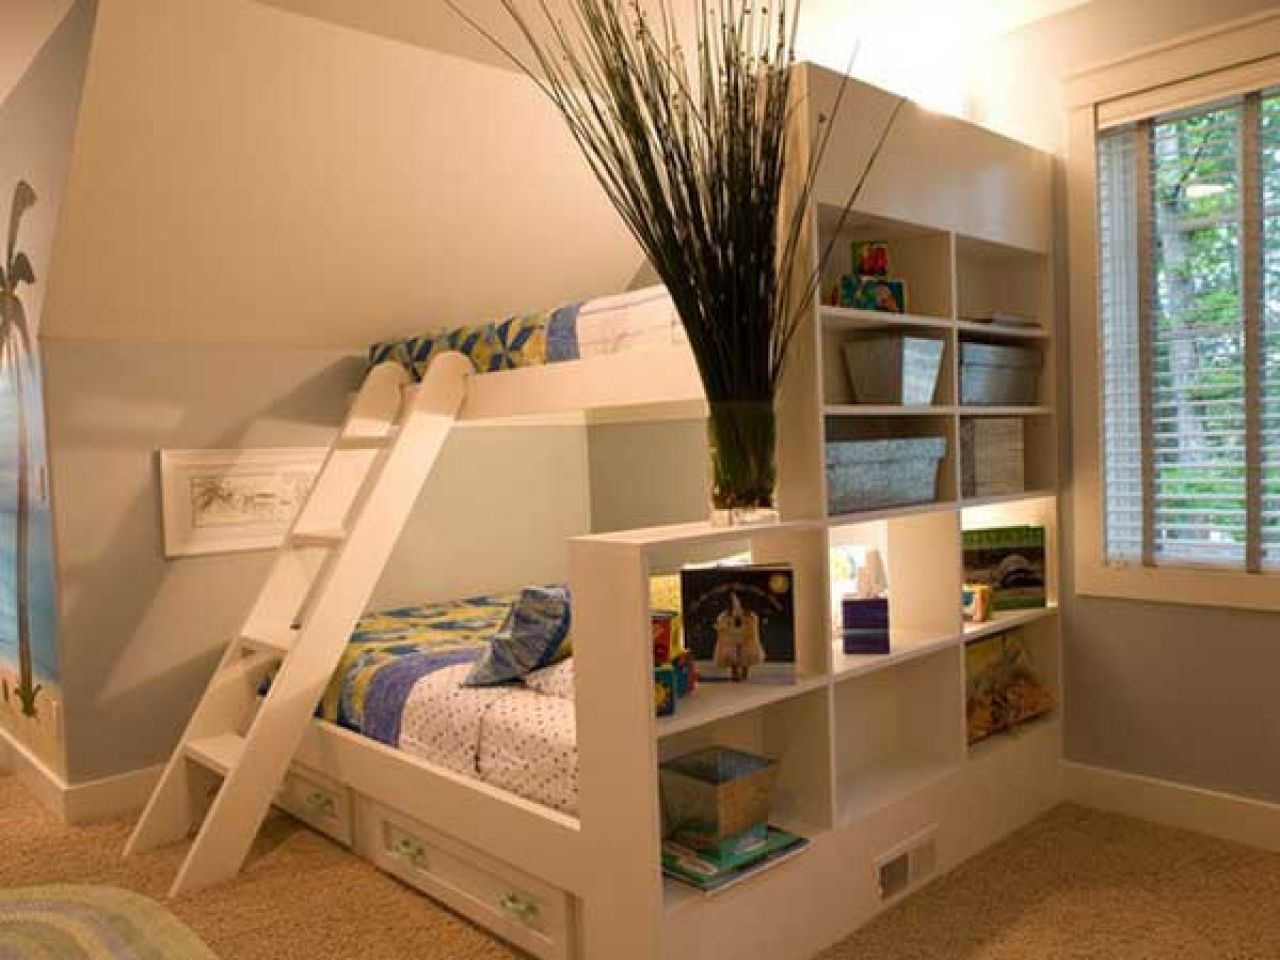 49 Space Saving Furniture Bedroom Ikea Hacks Custom bunk